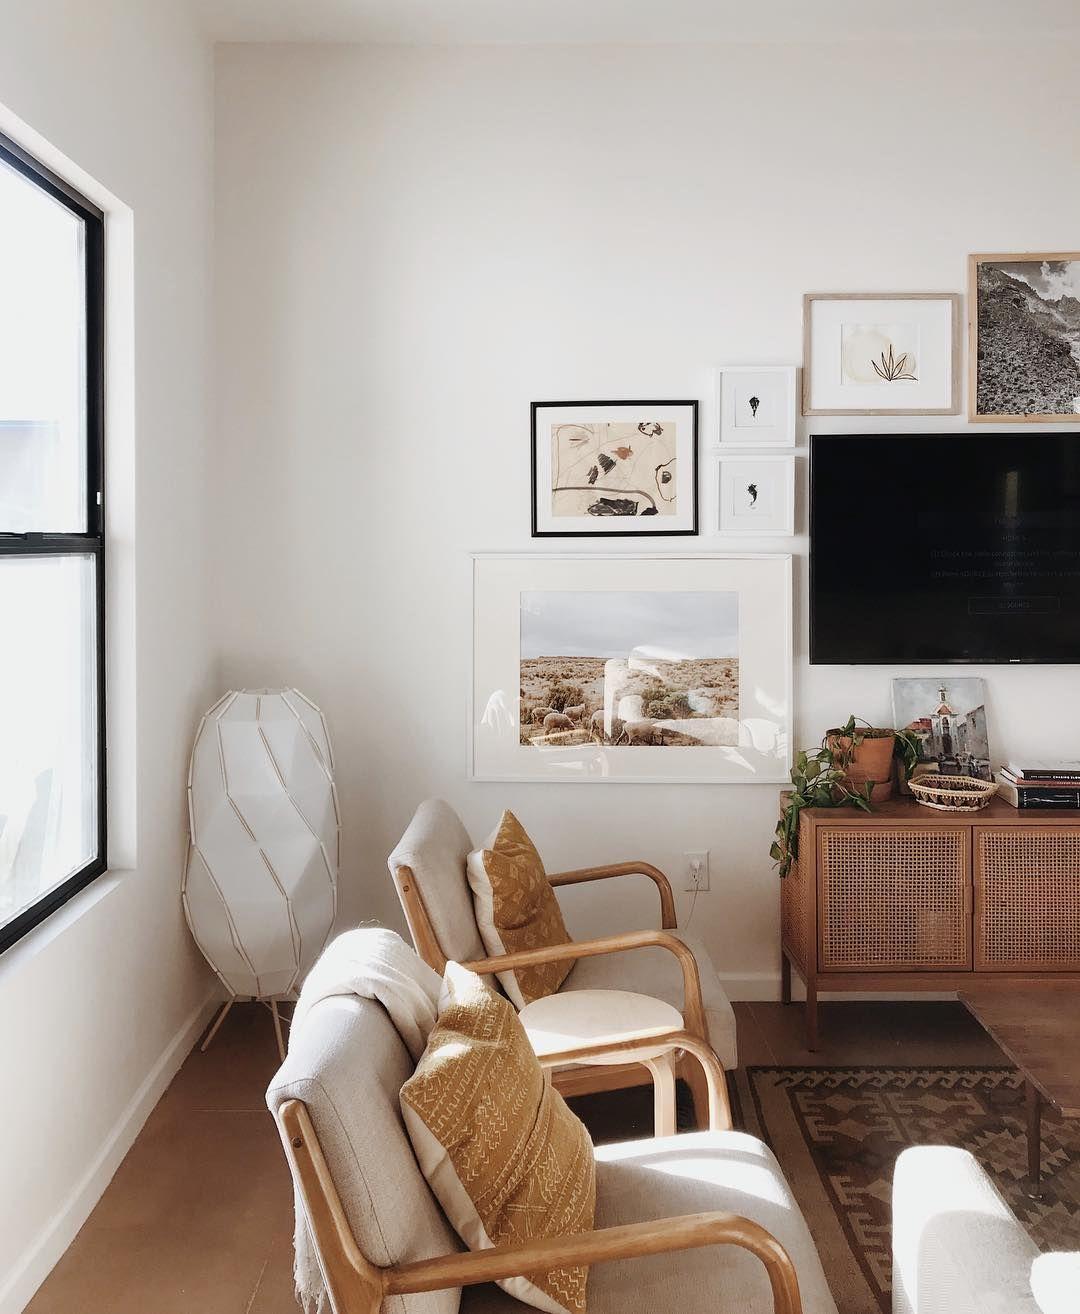 Light Airy With Warm Wood Tones Cozy Living Room Corner College Living Room Decor Living Room Decor Cozy Scandinavian Design Living Room